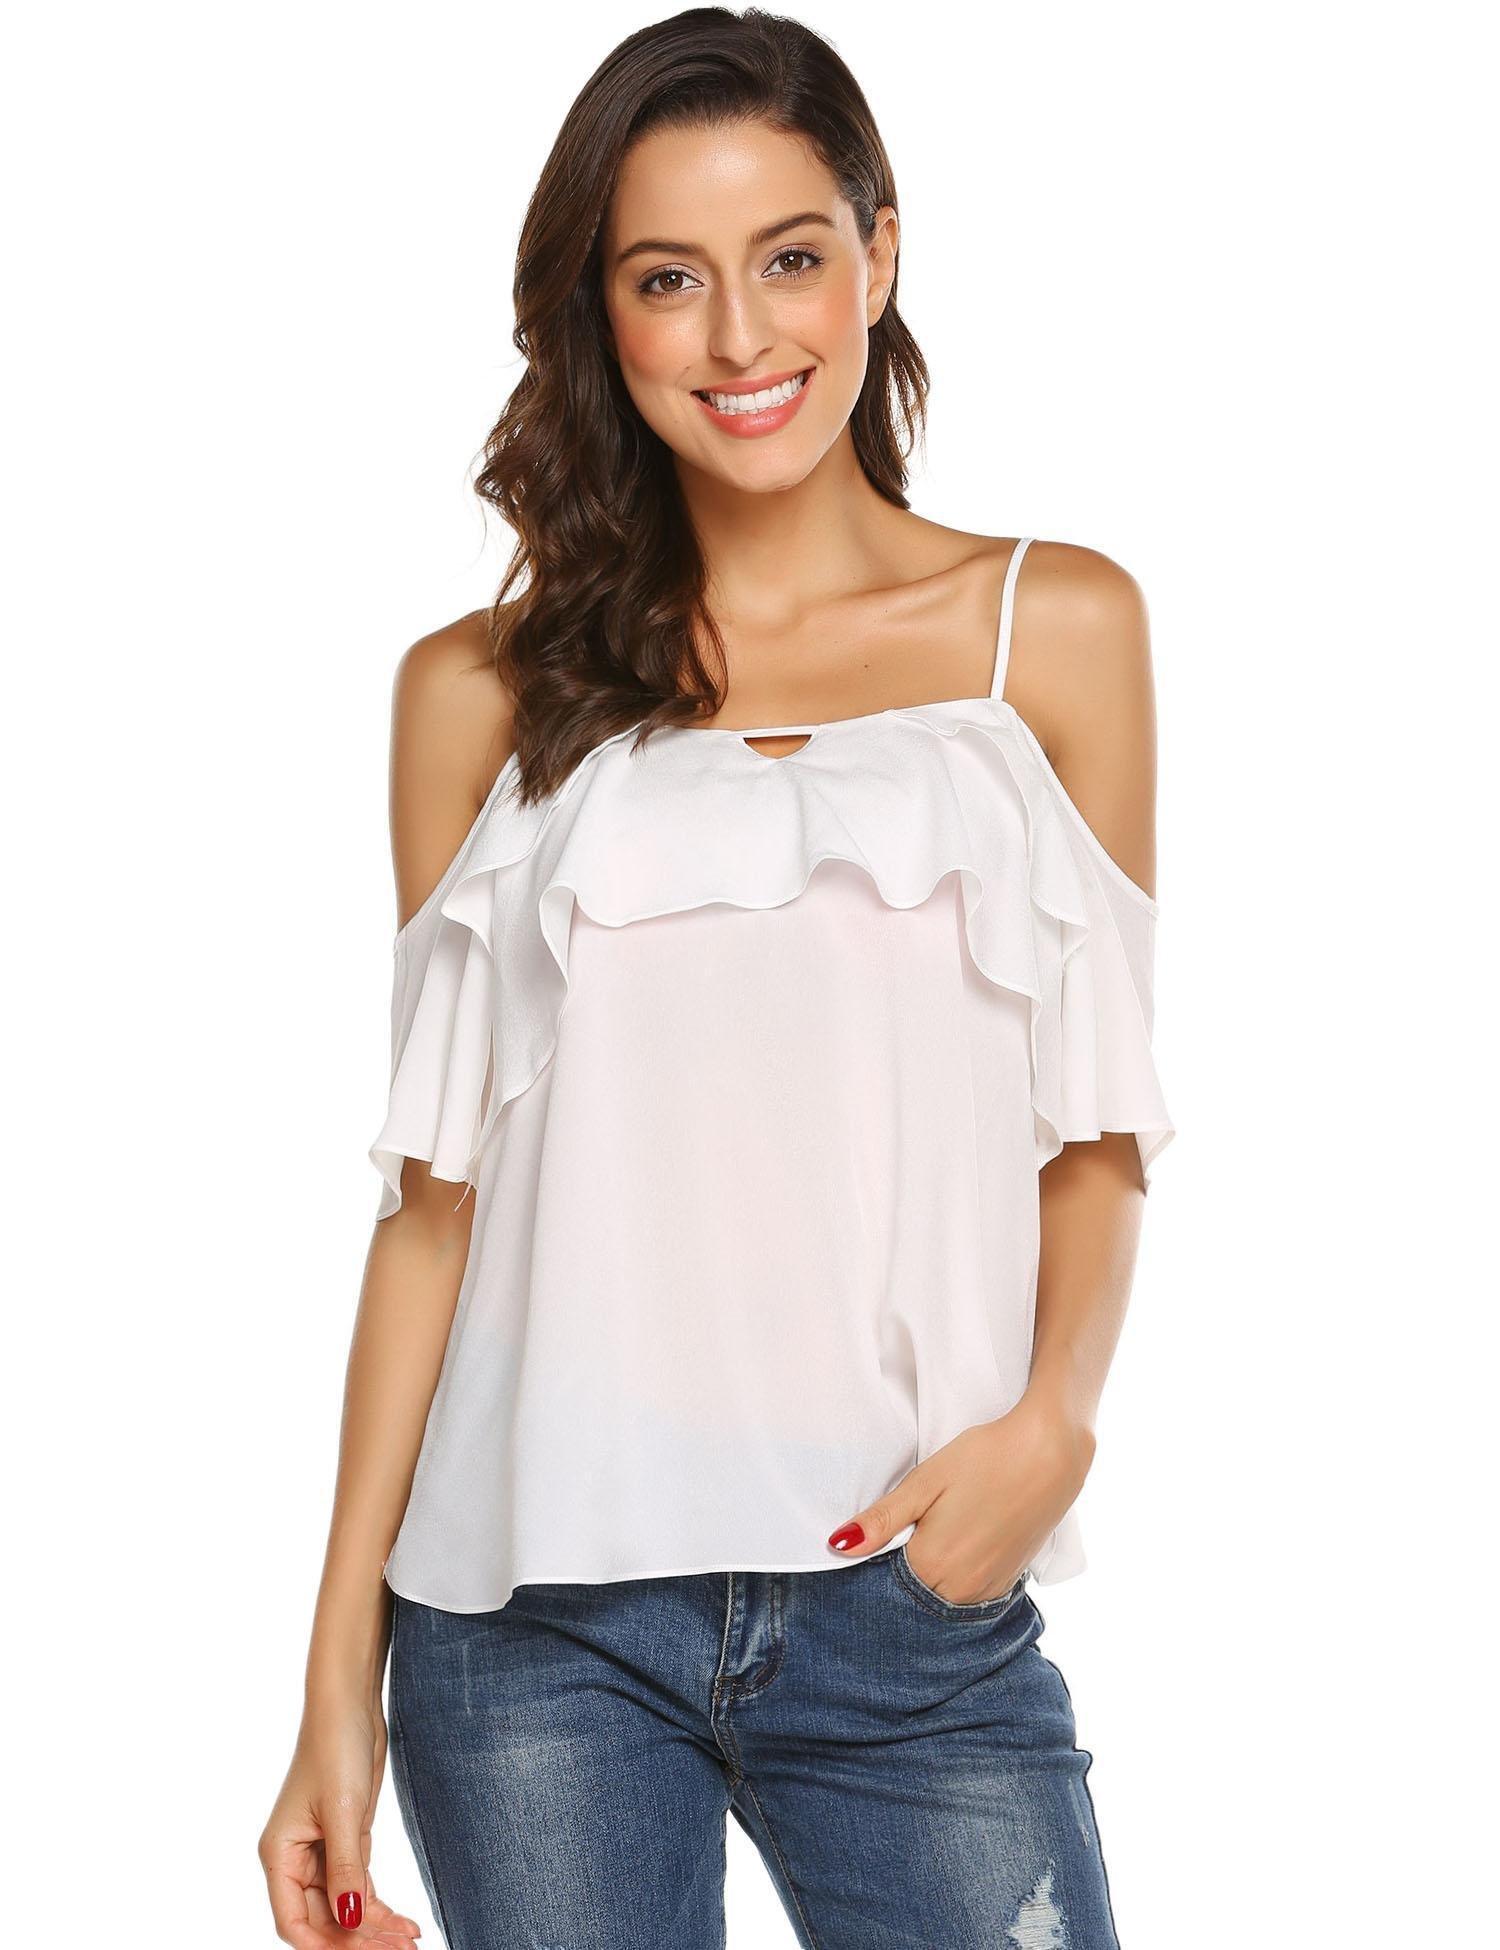 Grabsa Women's Summer Strap Cami Shirts Ruffle Chiffon Off Shoulder Blouse Tops White L